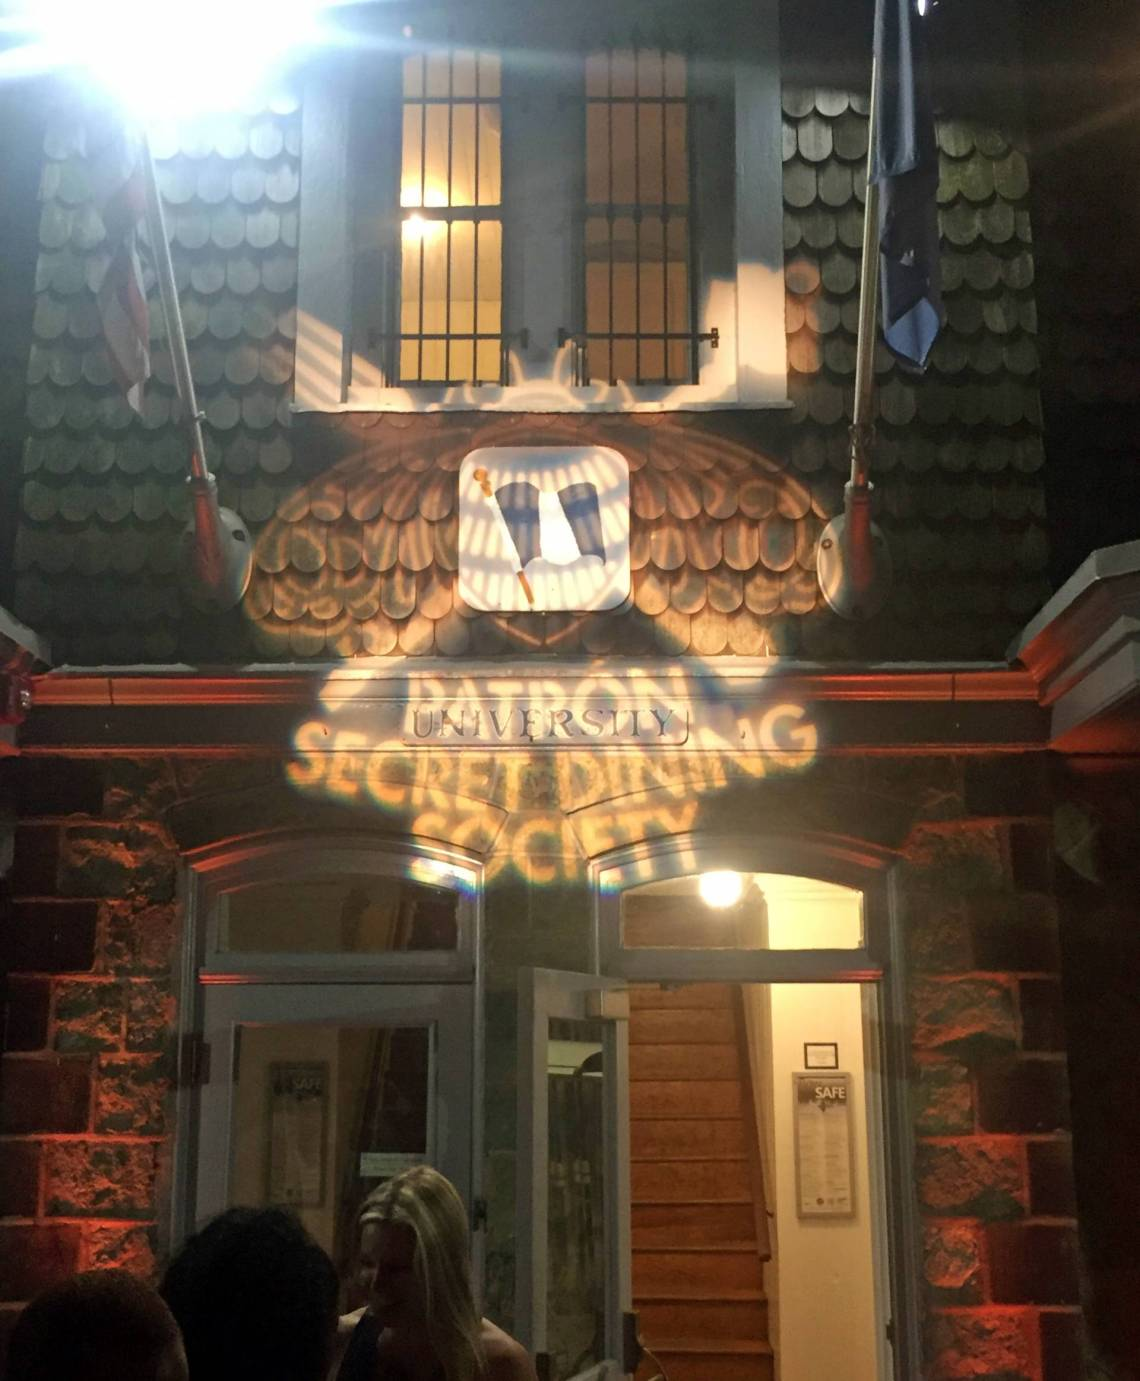 patron secret dining society